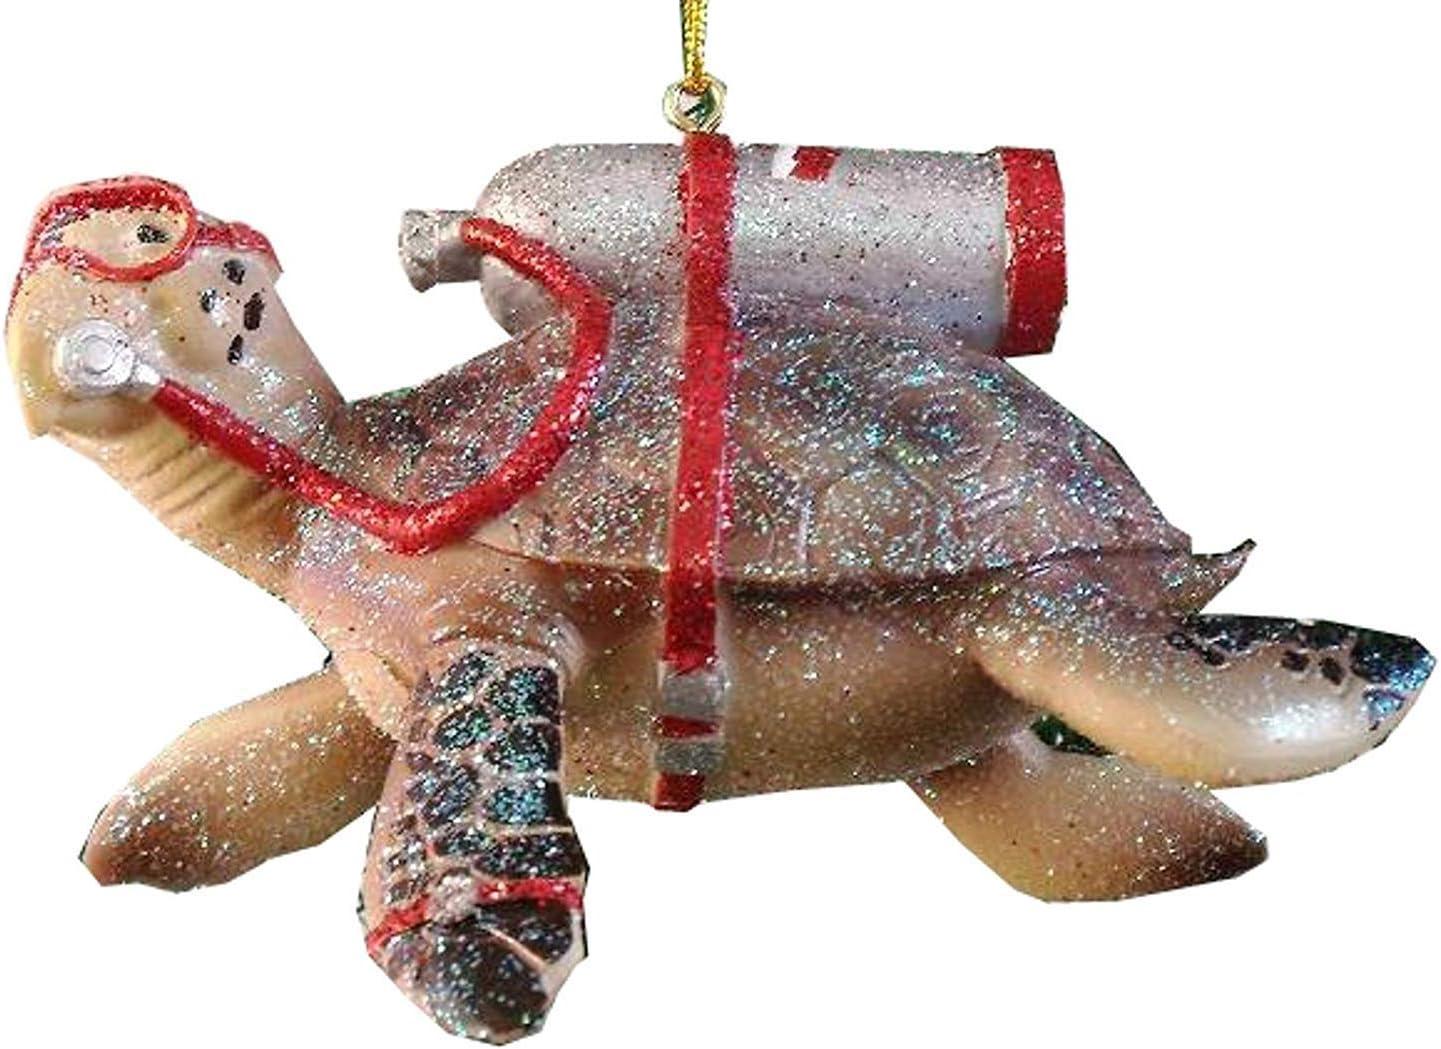 December Diamonds Tortuga Scuba Diving Sea Turtle Christmas Ornament 5590387 New